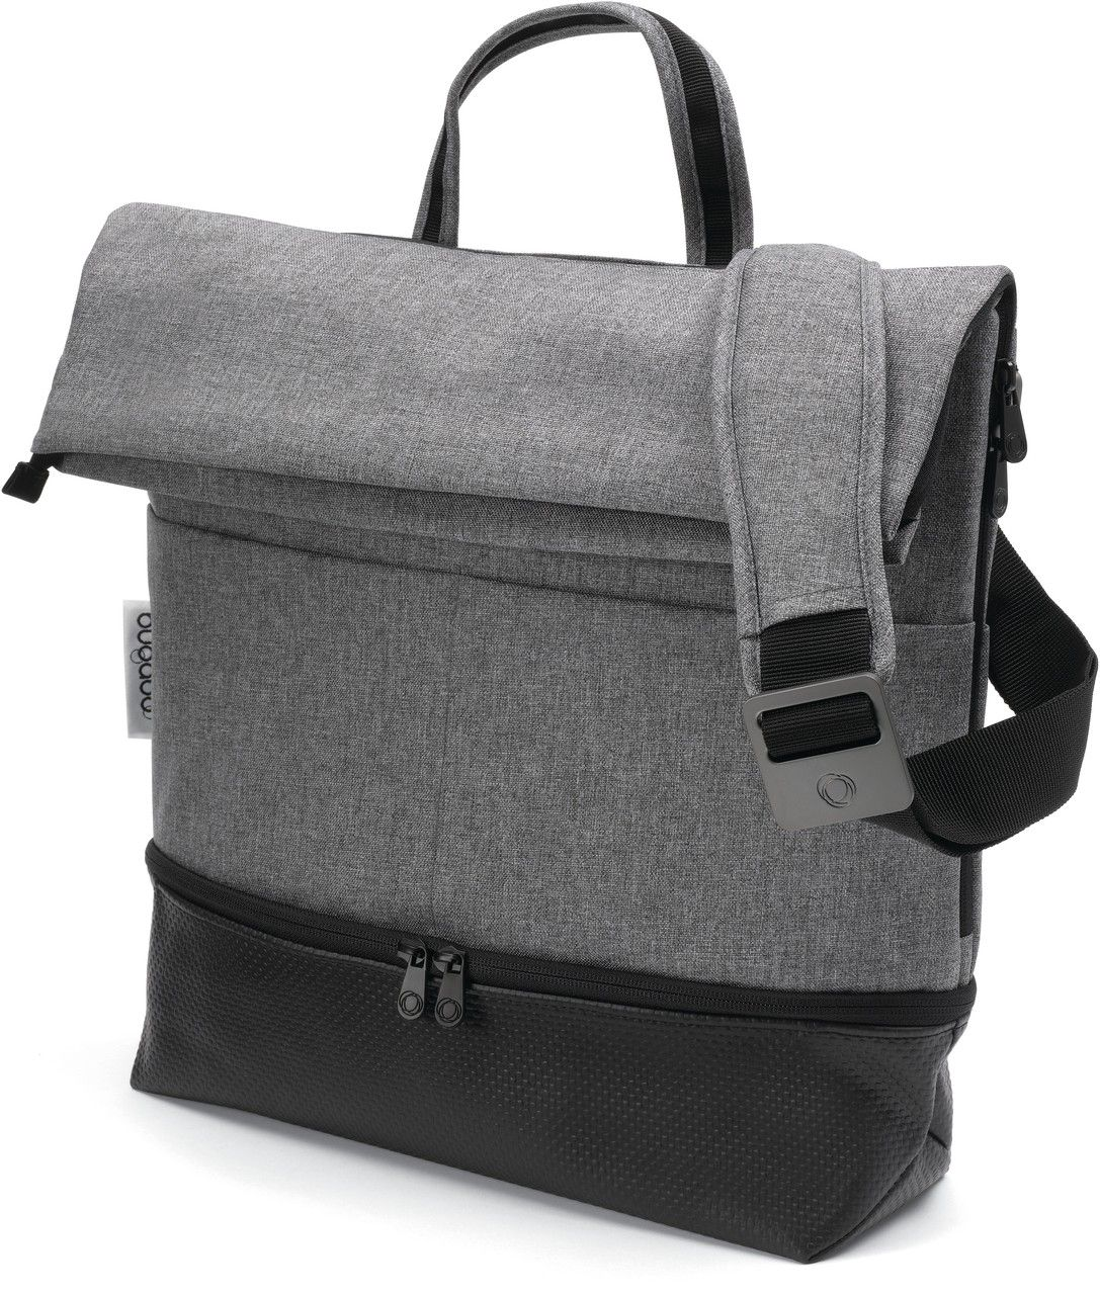 Bugaboo Cameleon 3 >> Wickeltasche Bag Bugaboo - Kleine Fabriek